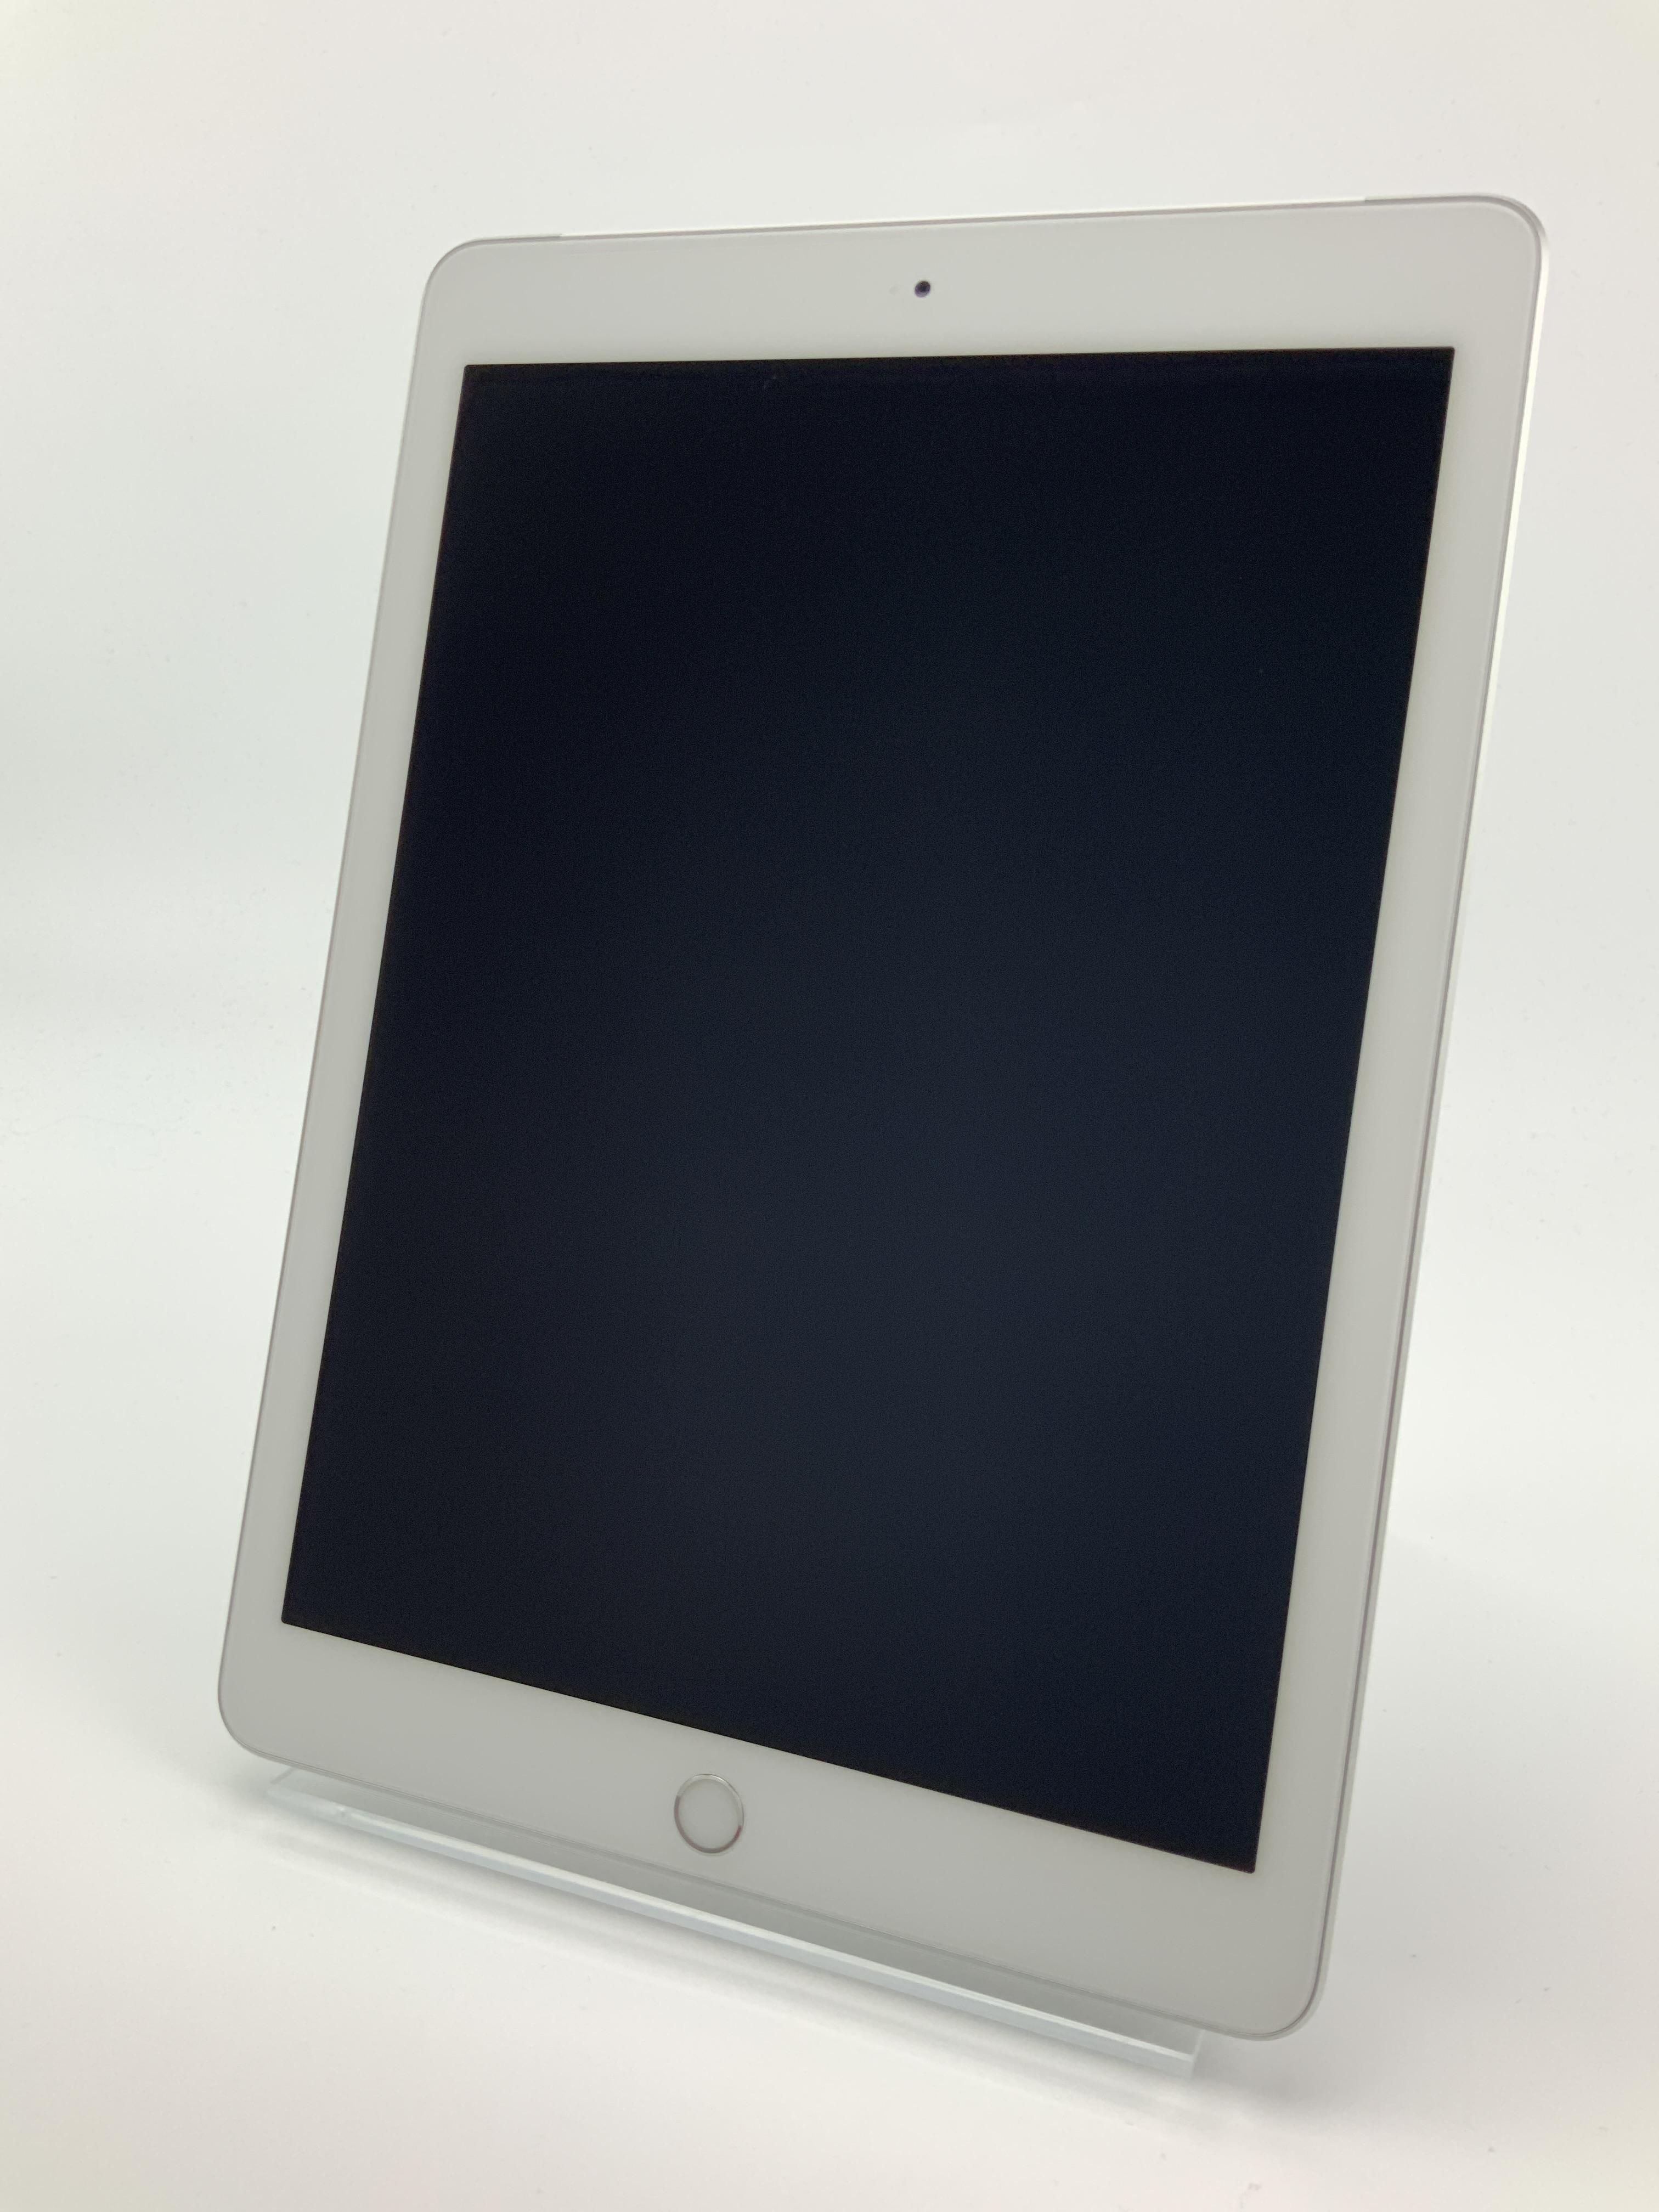 iPad 5 Wi-Fi + Cellular 32GB, 32GB, Silver, immagine 1